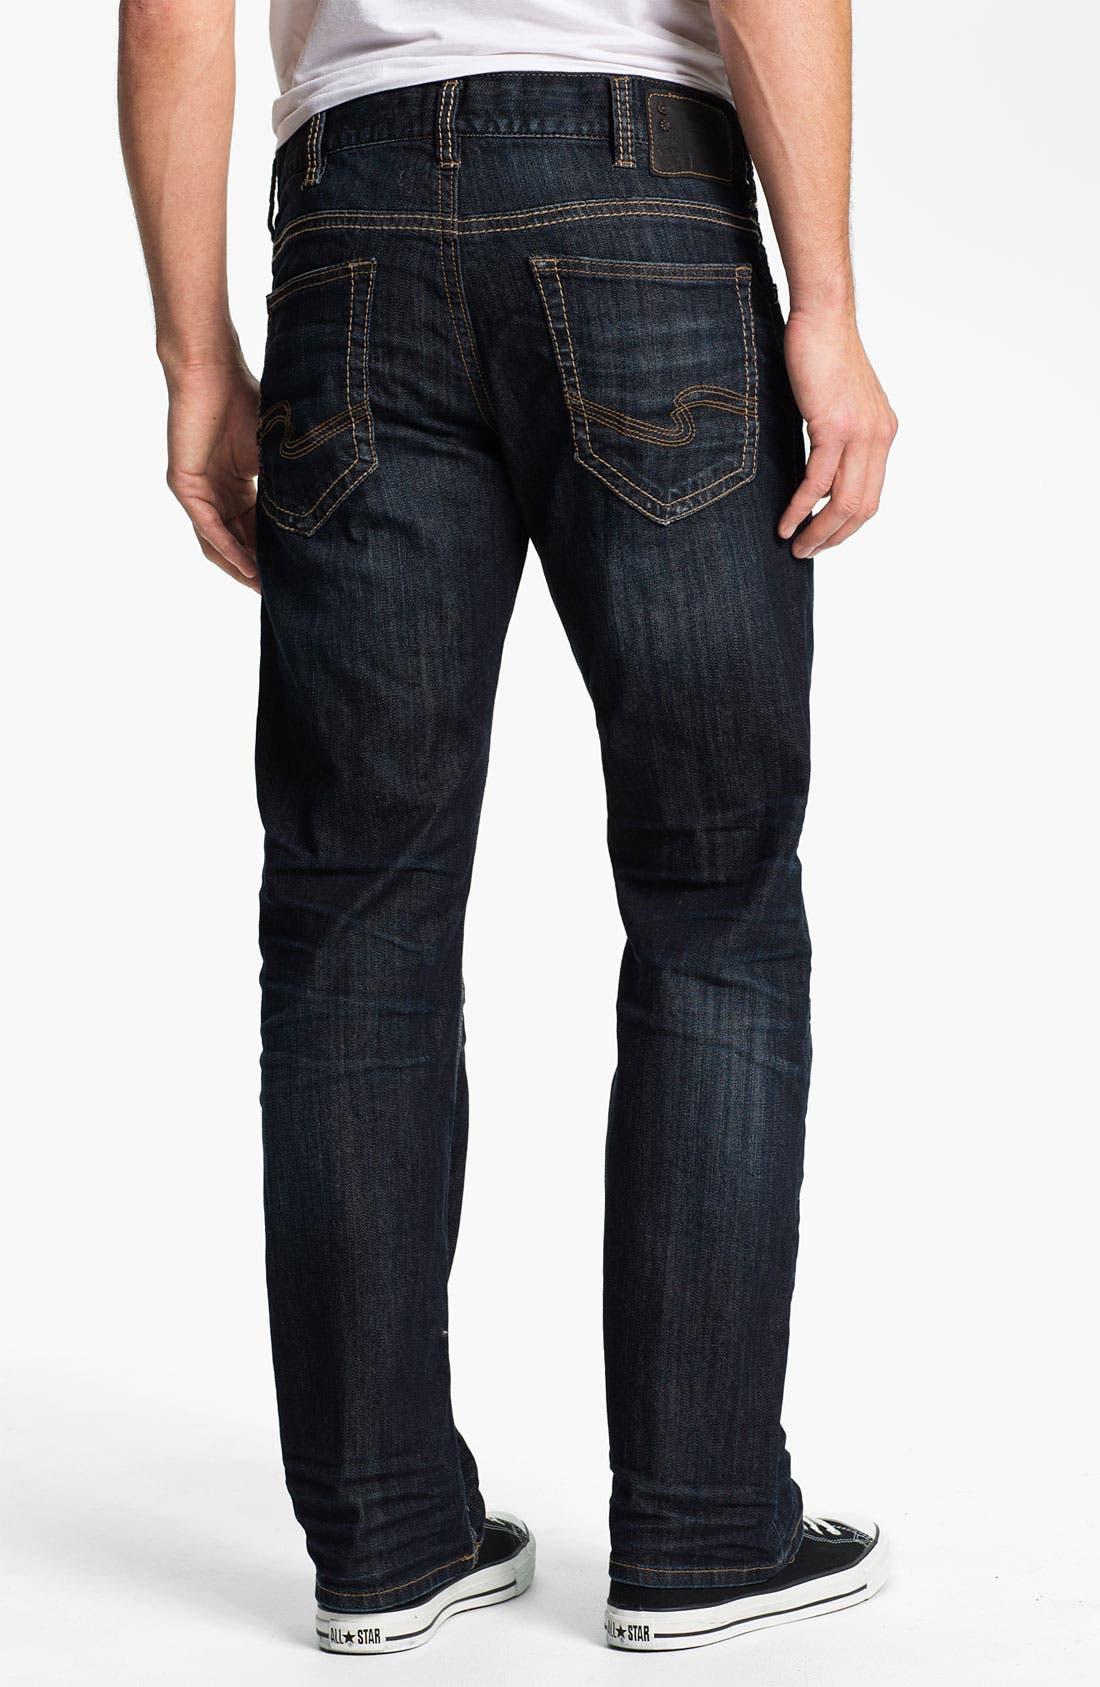 Alternate Image 1 Selected - Silver Jeans Co. 'Zac' Straight Leg Jeans (Indigo)